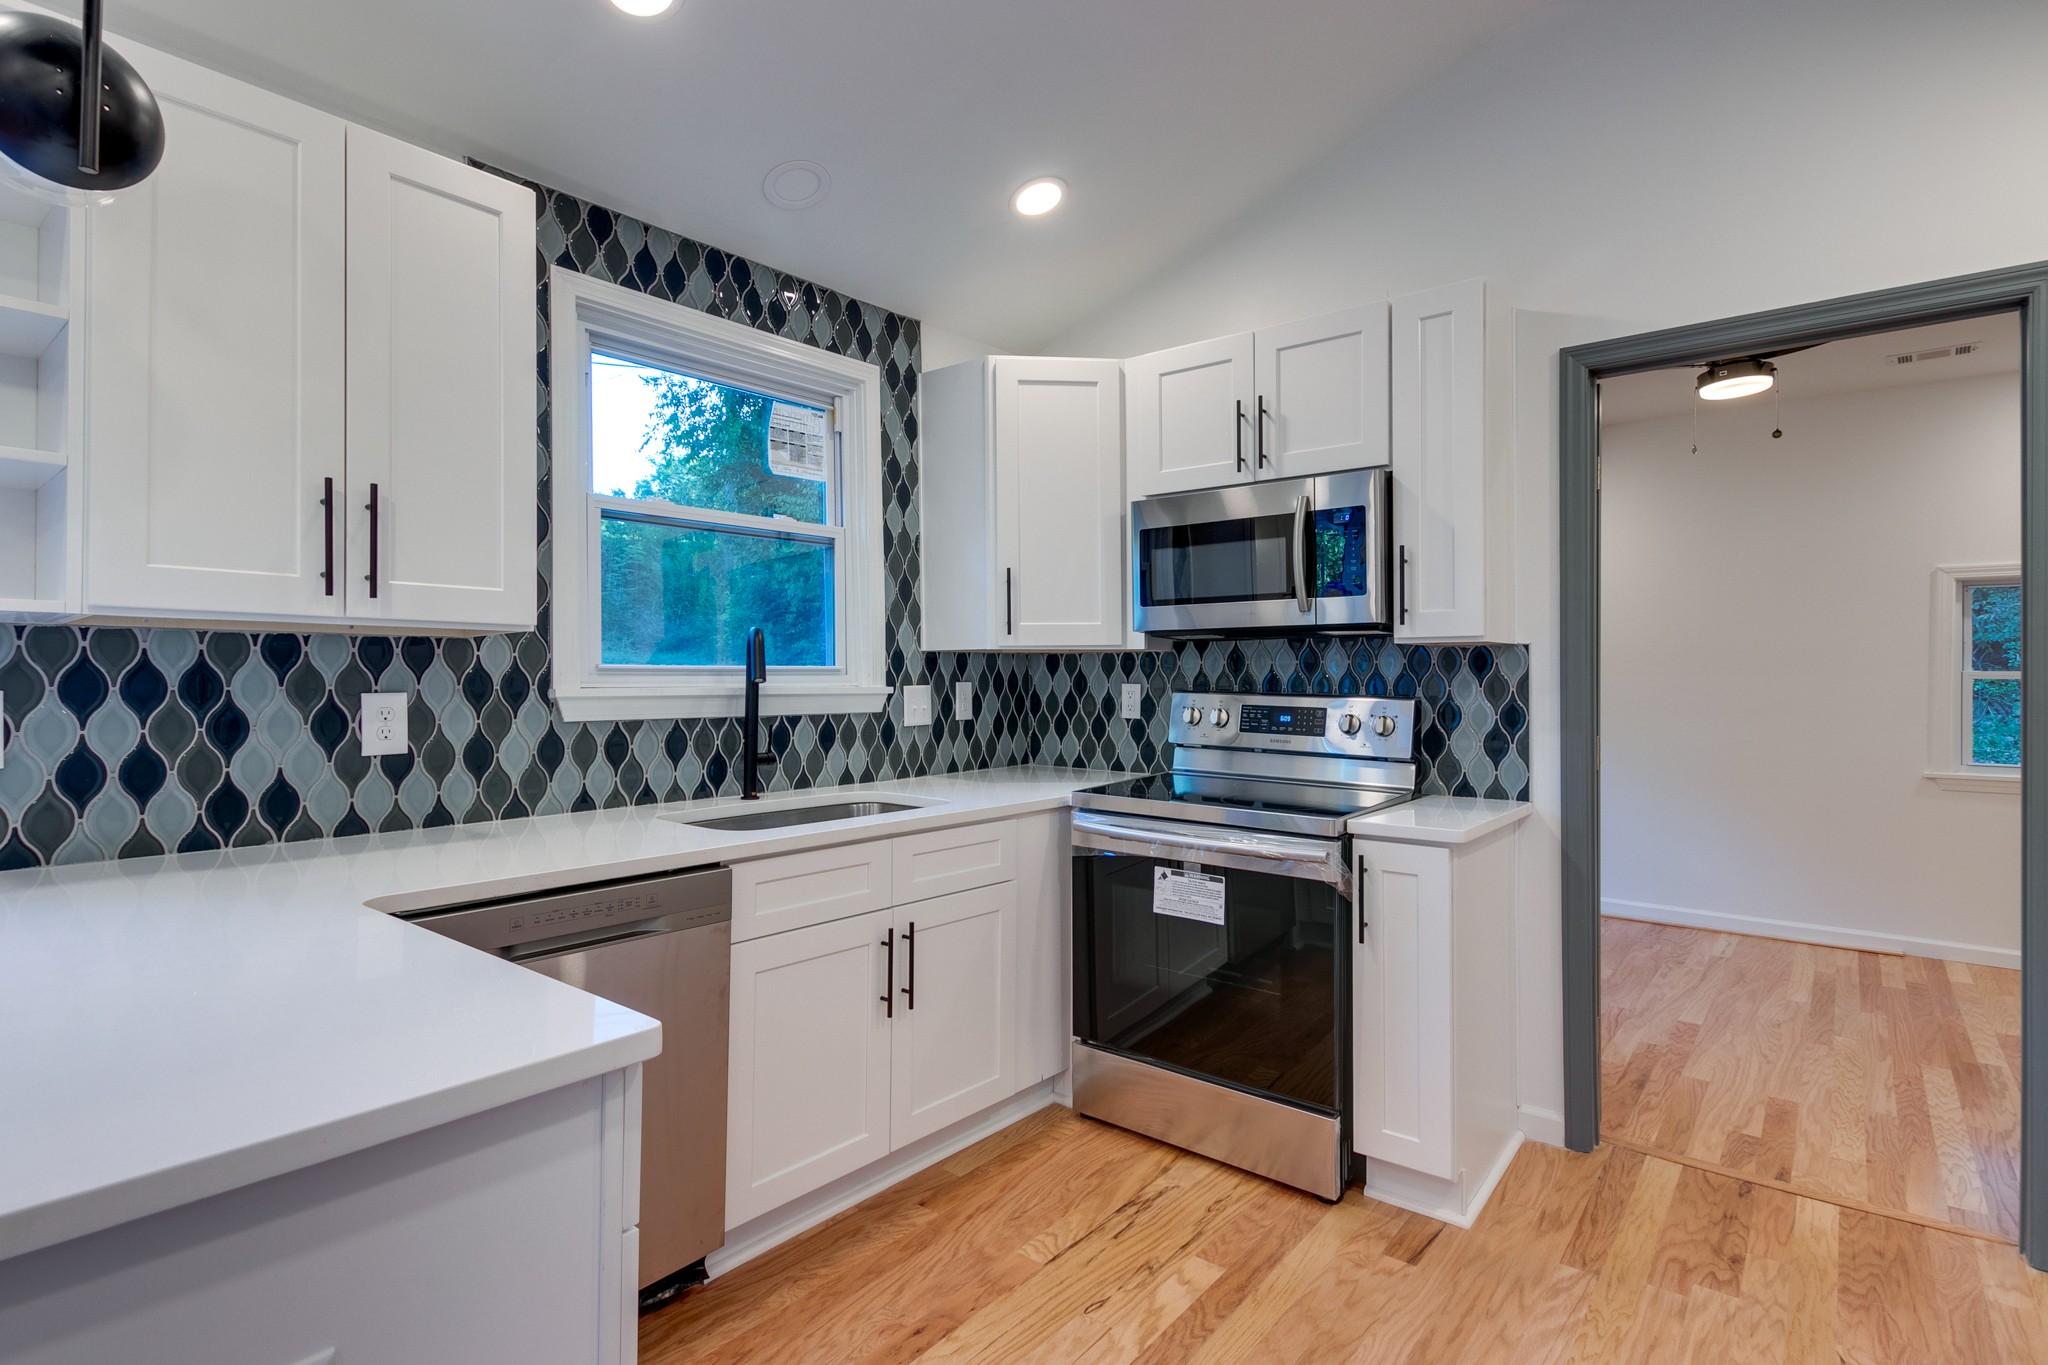 78 E Thompson Ln, Nashville, TN 37211 - Nashville, TN real estate listing